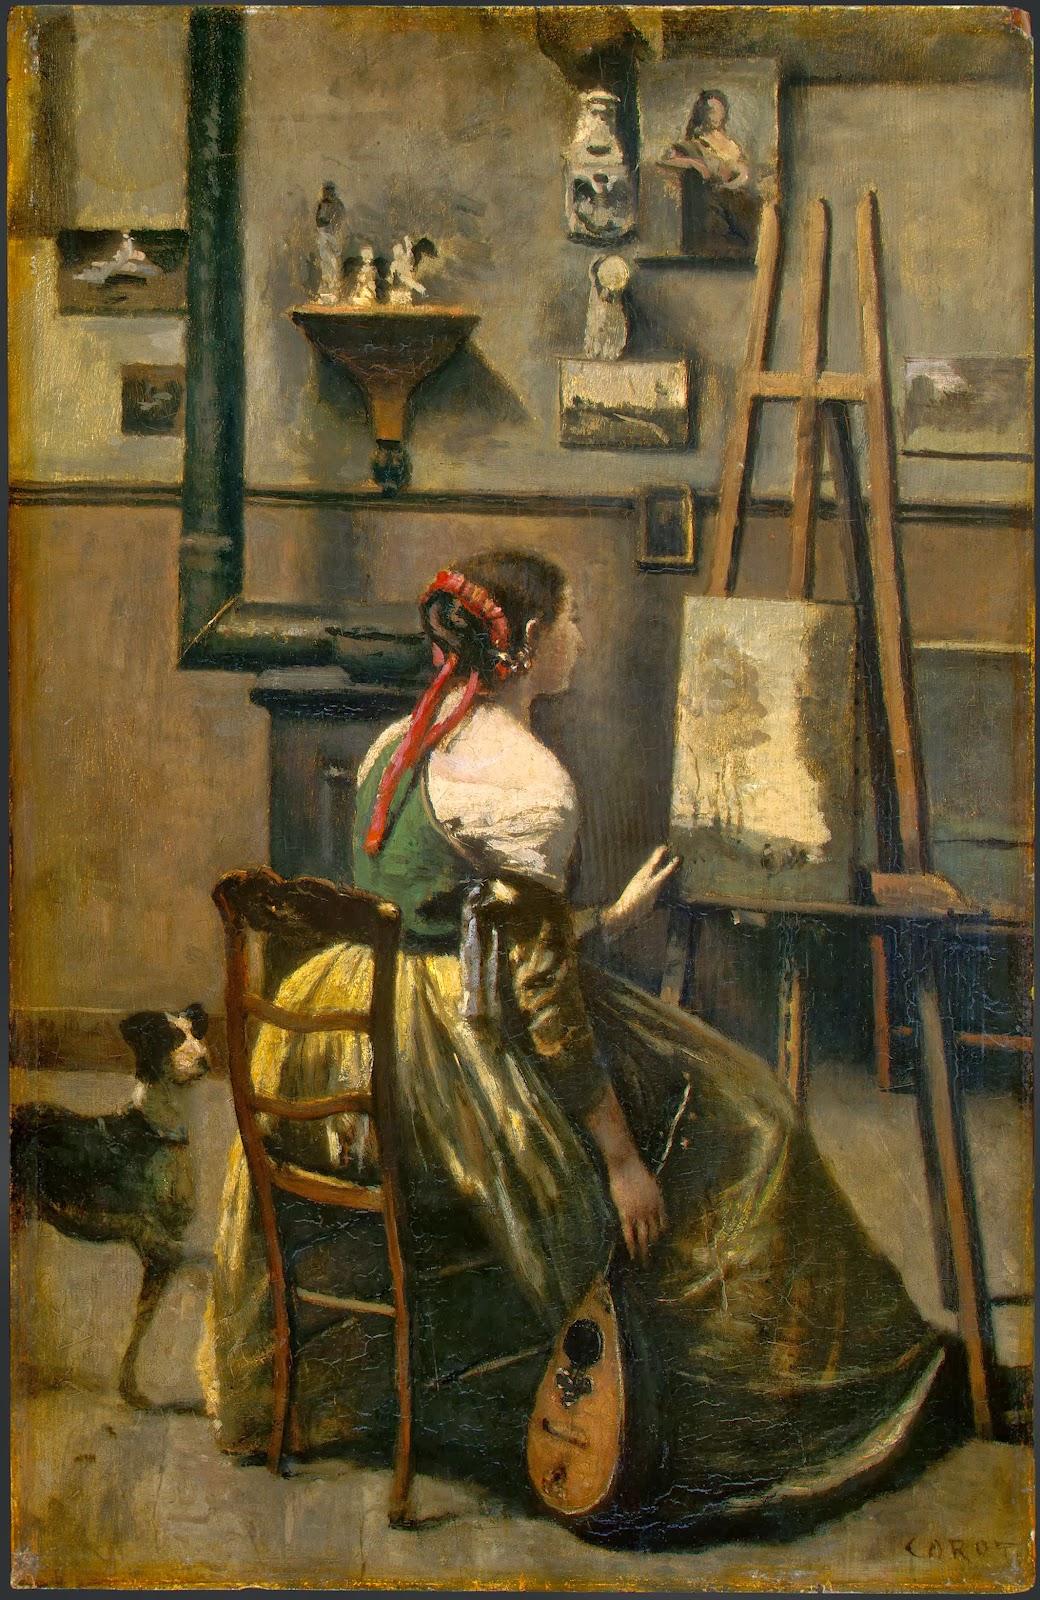 L'atelier de Corot, ca. 1868